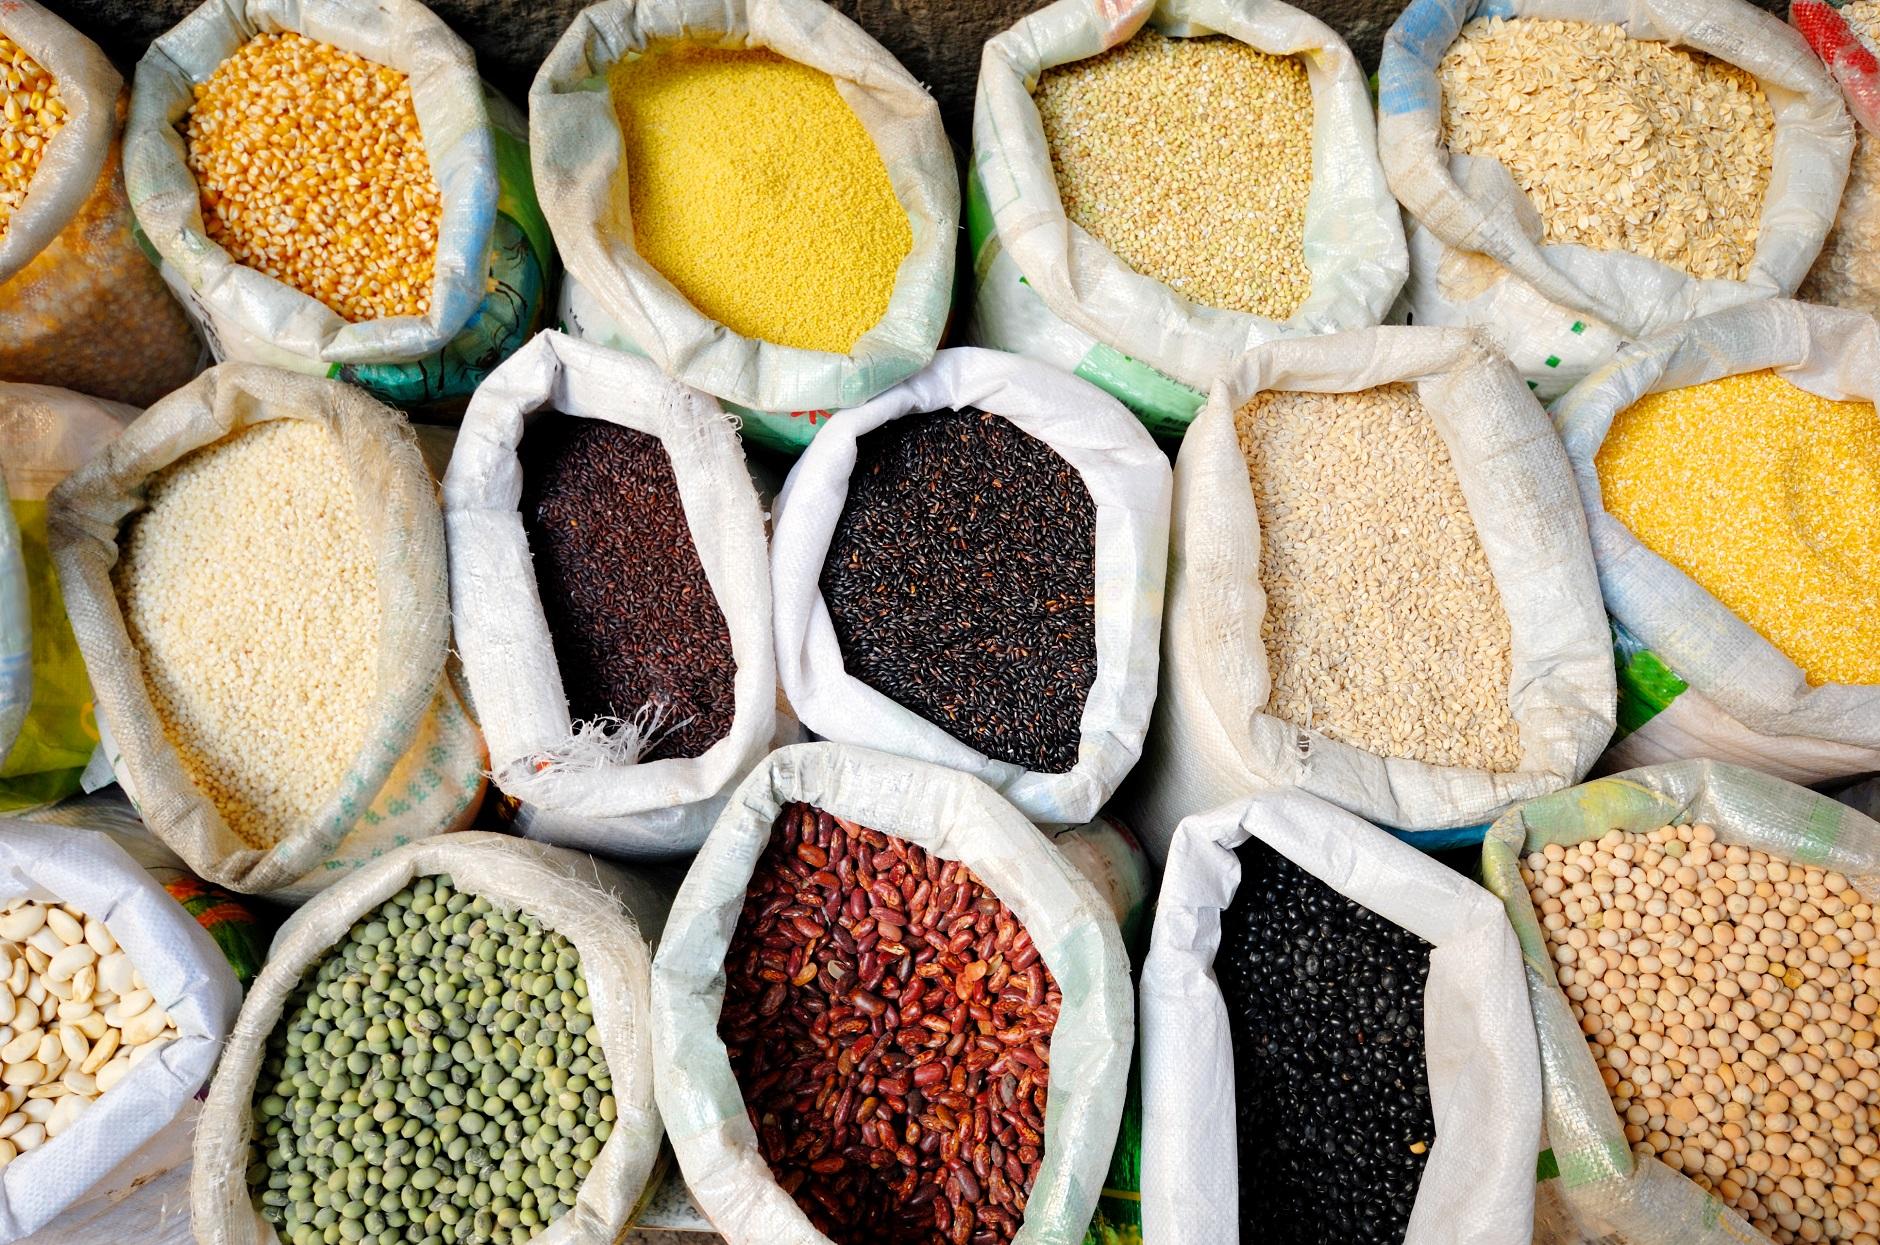 Bangladesh has announced a tender to buy 50K MTS of non-basmati rice